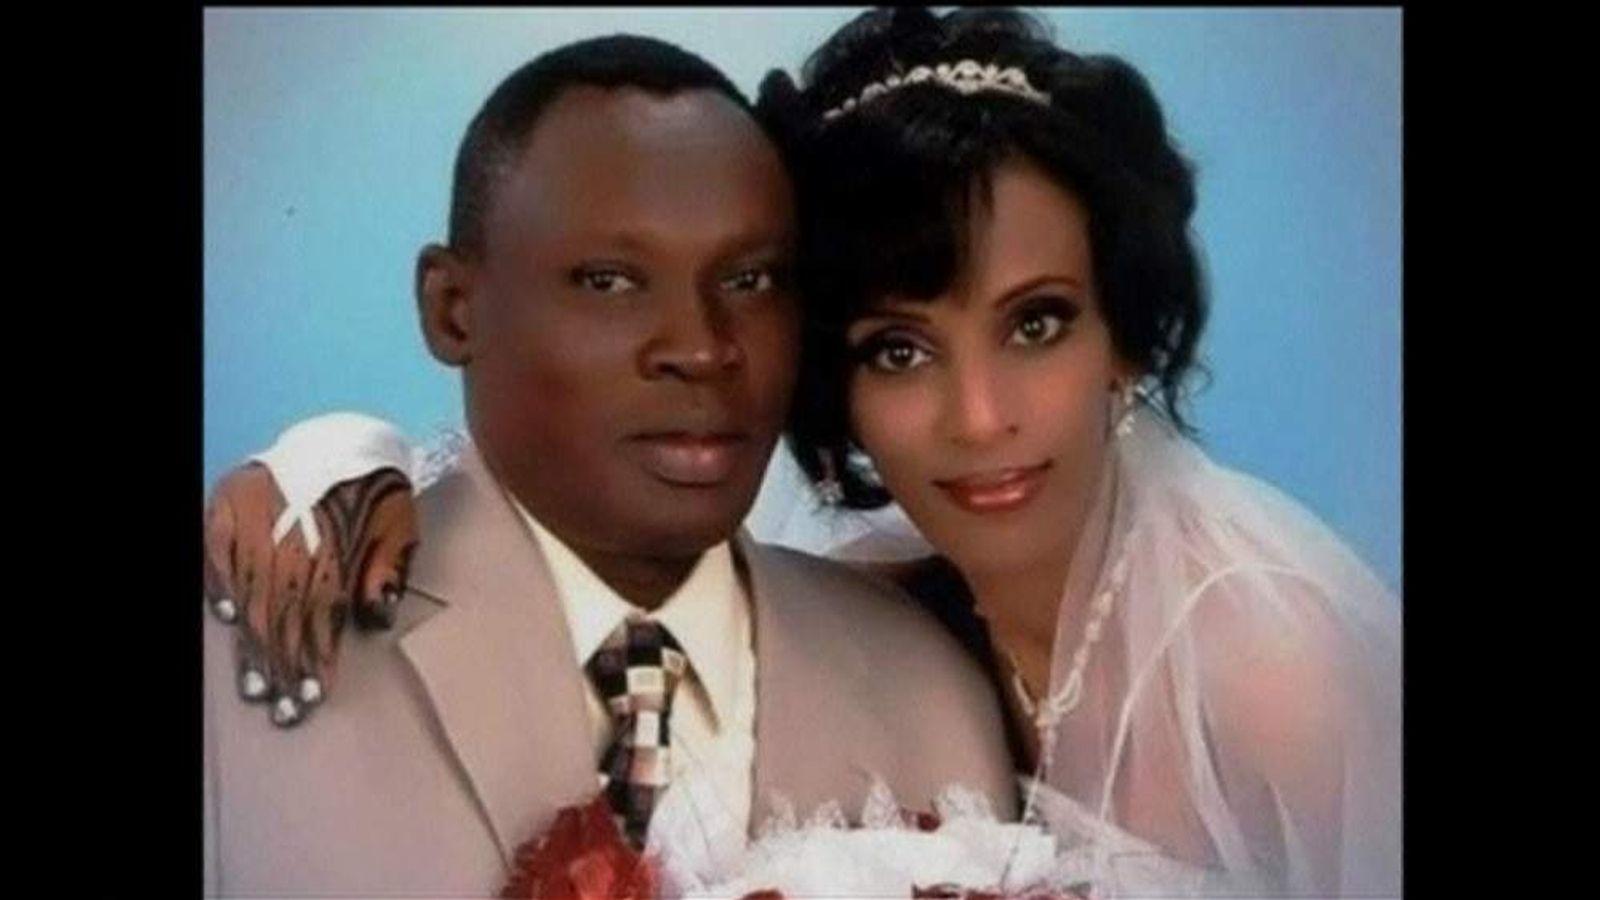 Daniel Wani and Mariam Yehya Ibrahim on their wedding day